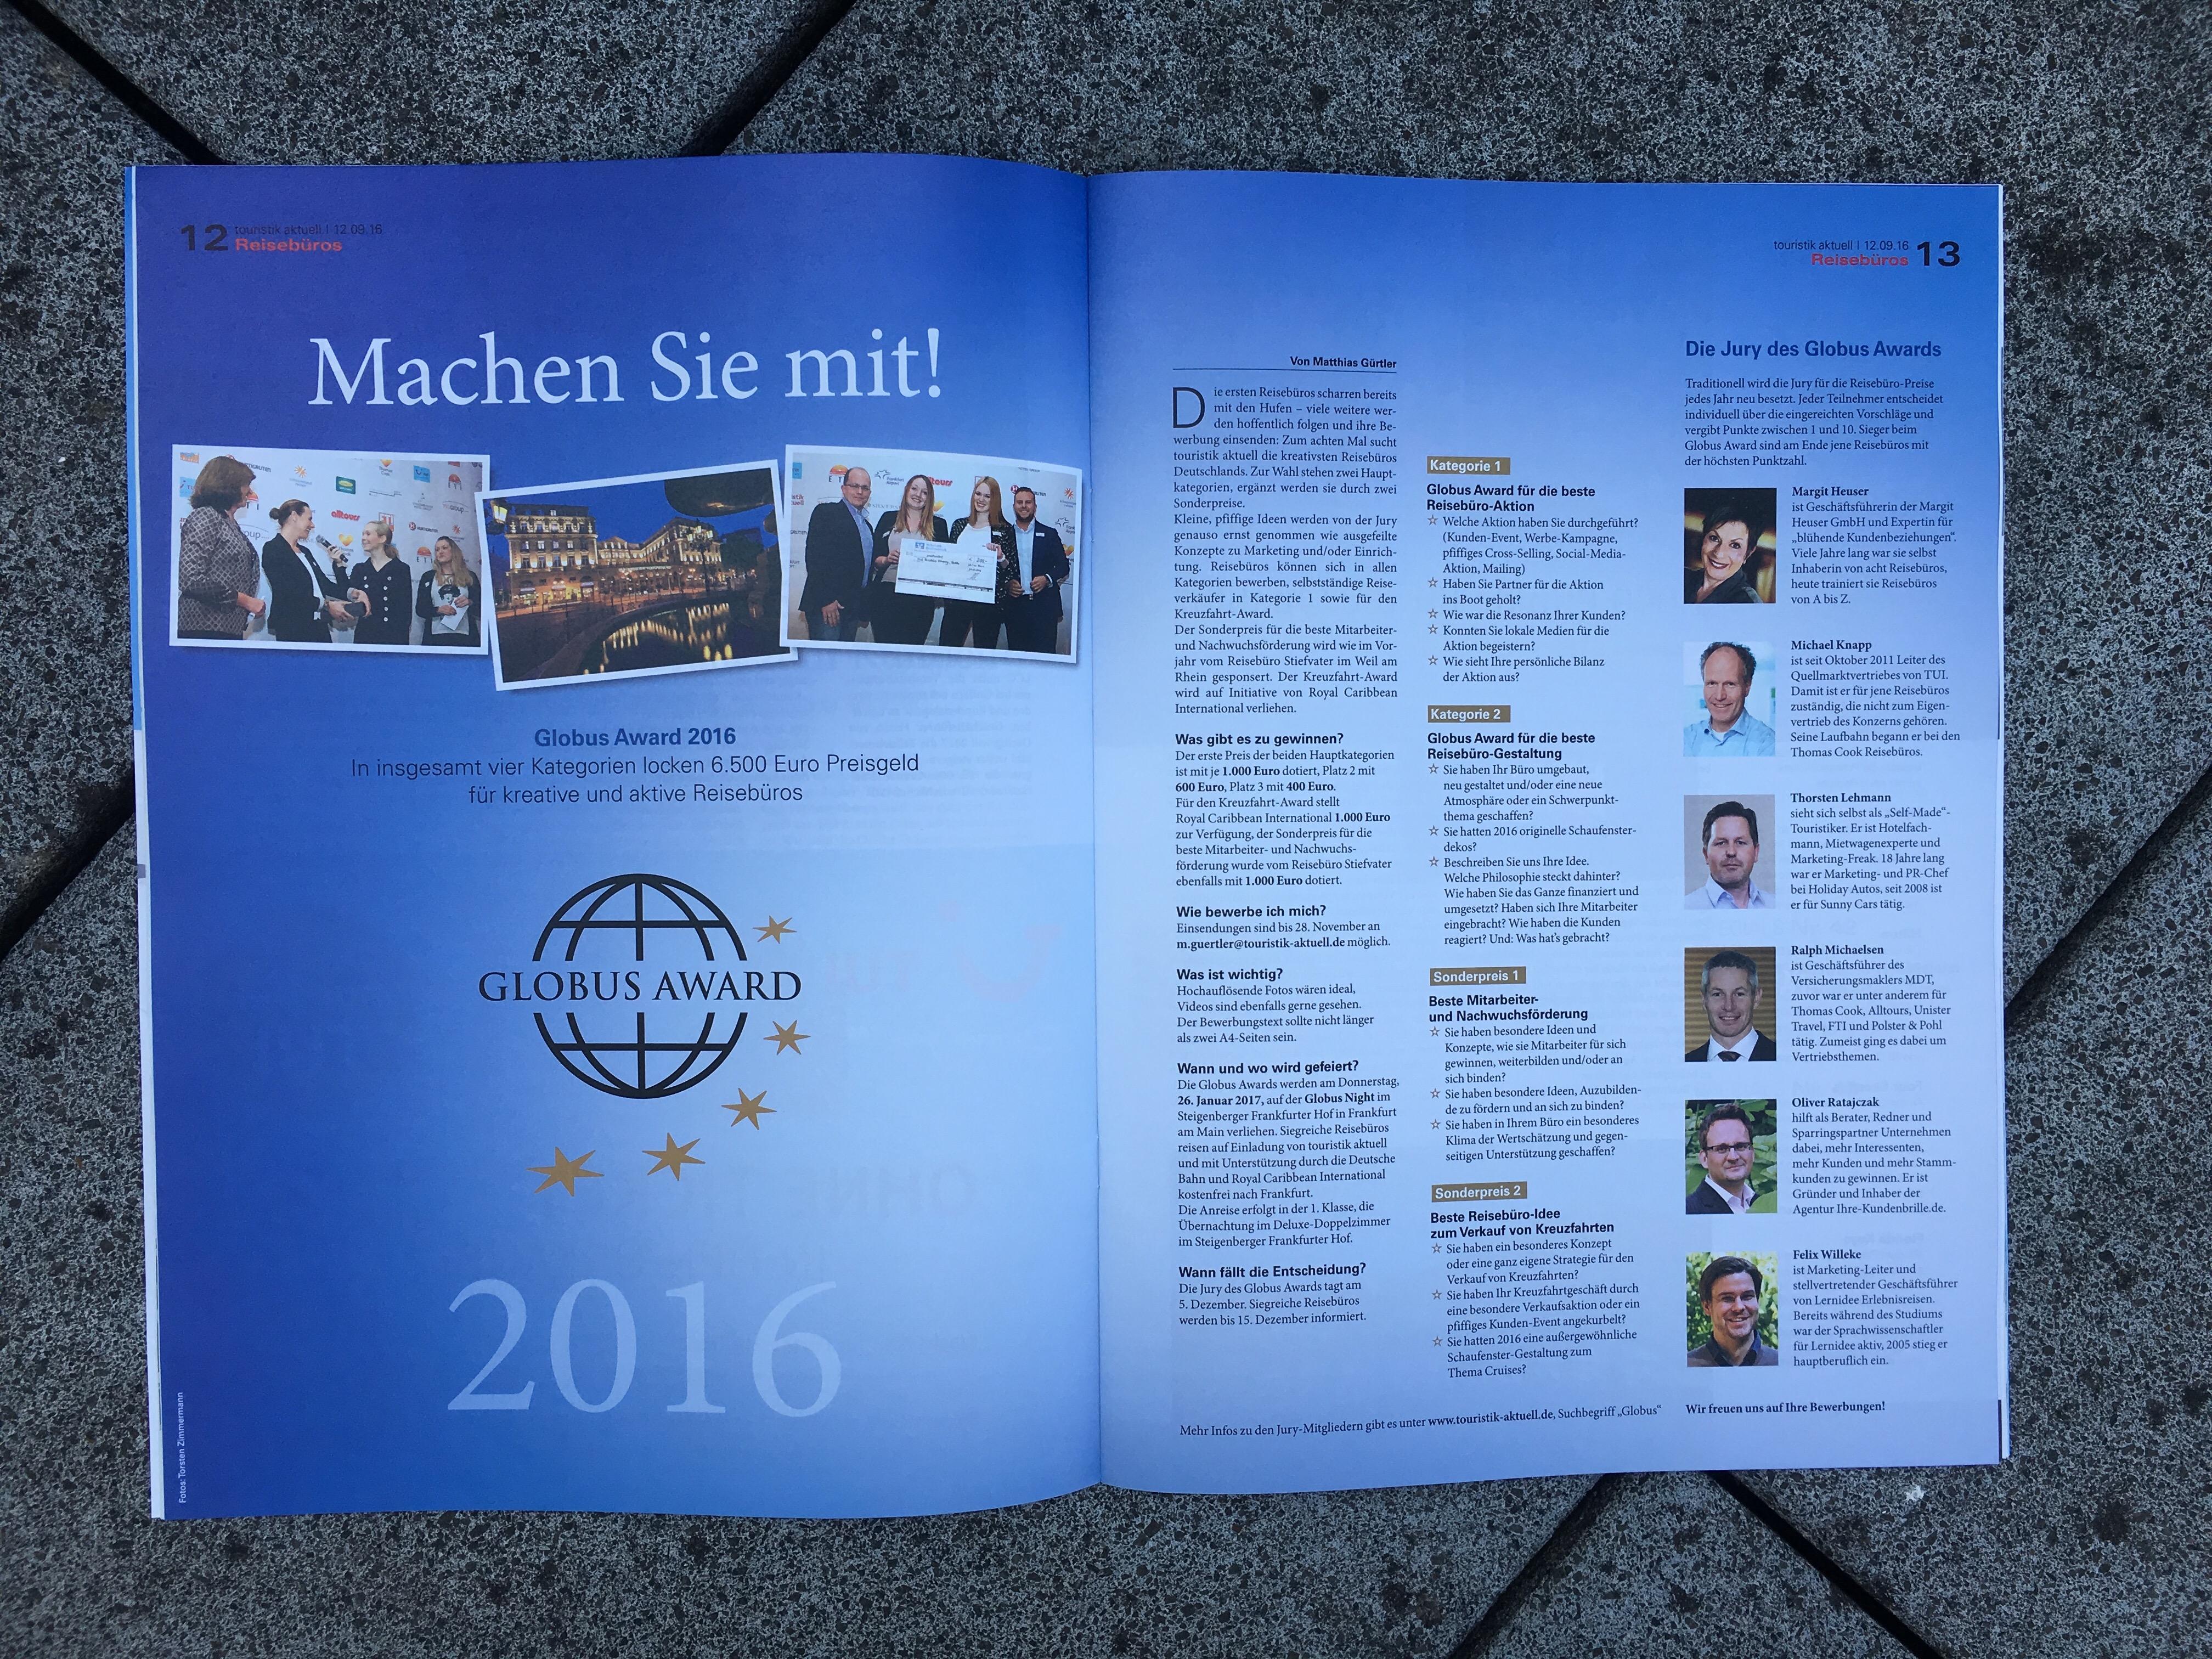 Globus Award 2016 Jury